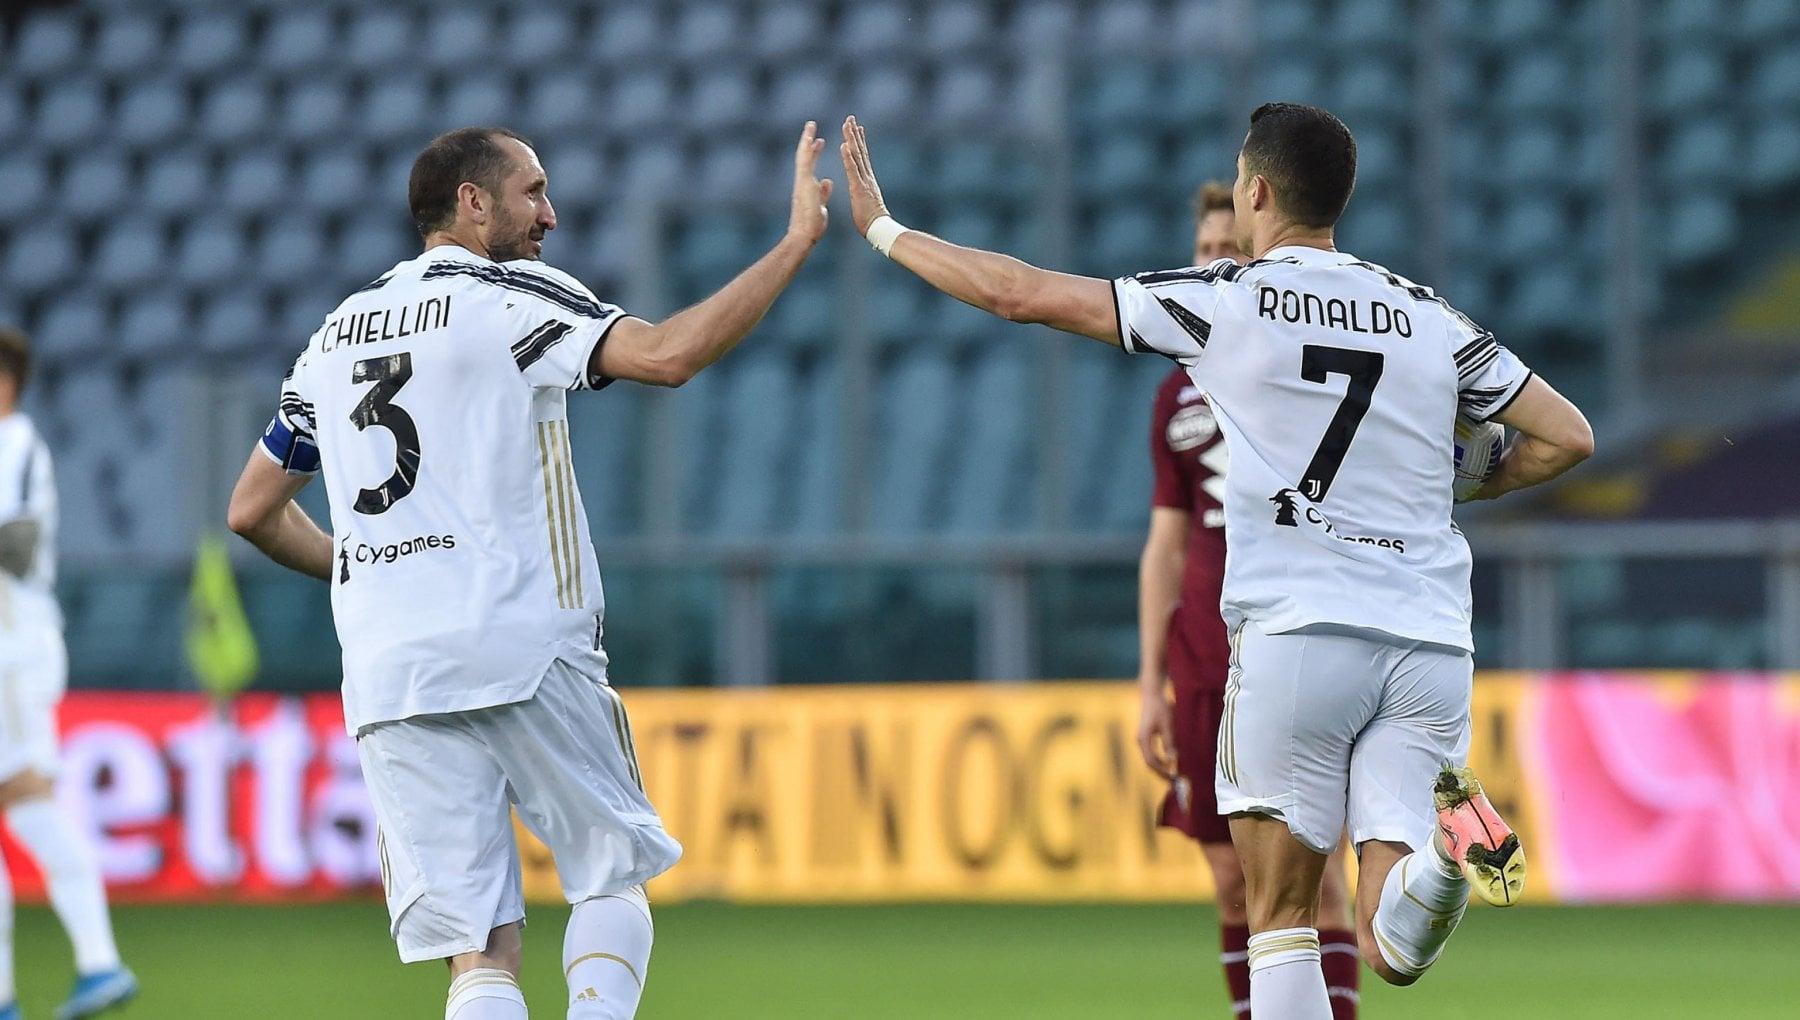 Torino-Juventus 2-2: Sanabria illude i granata, Ronaldo salva i bianconeri